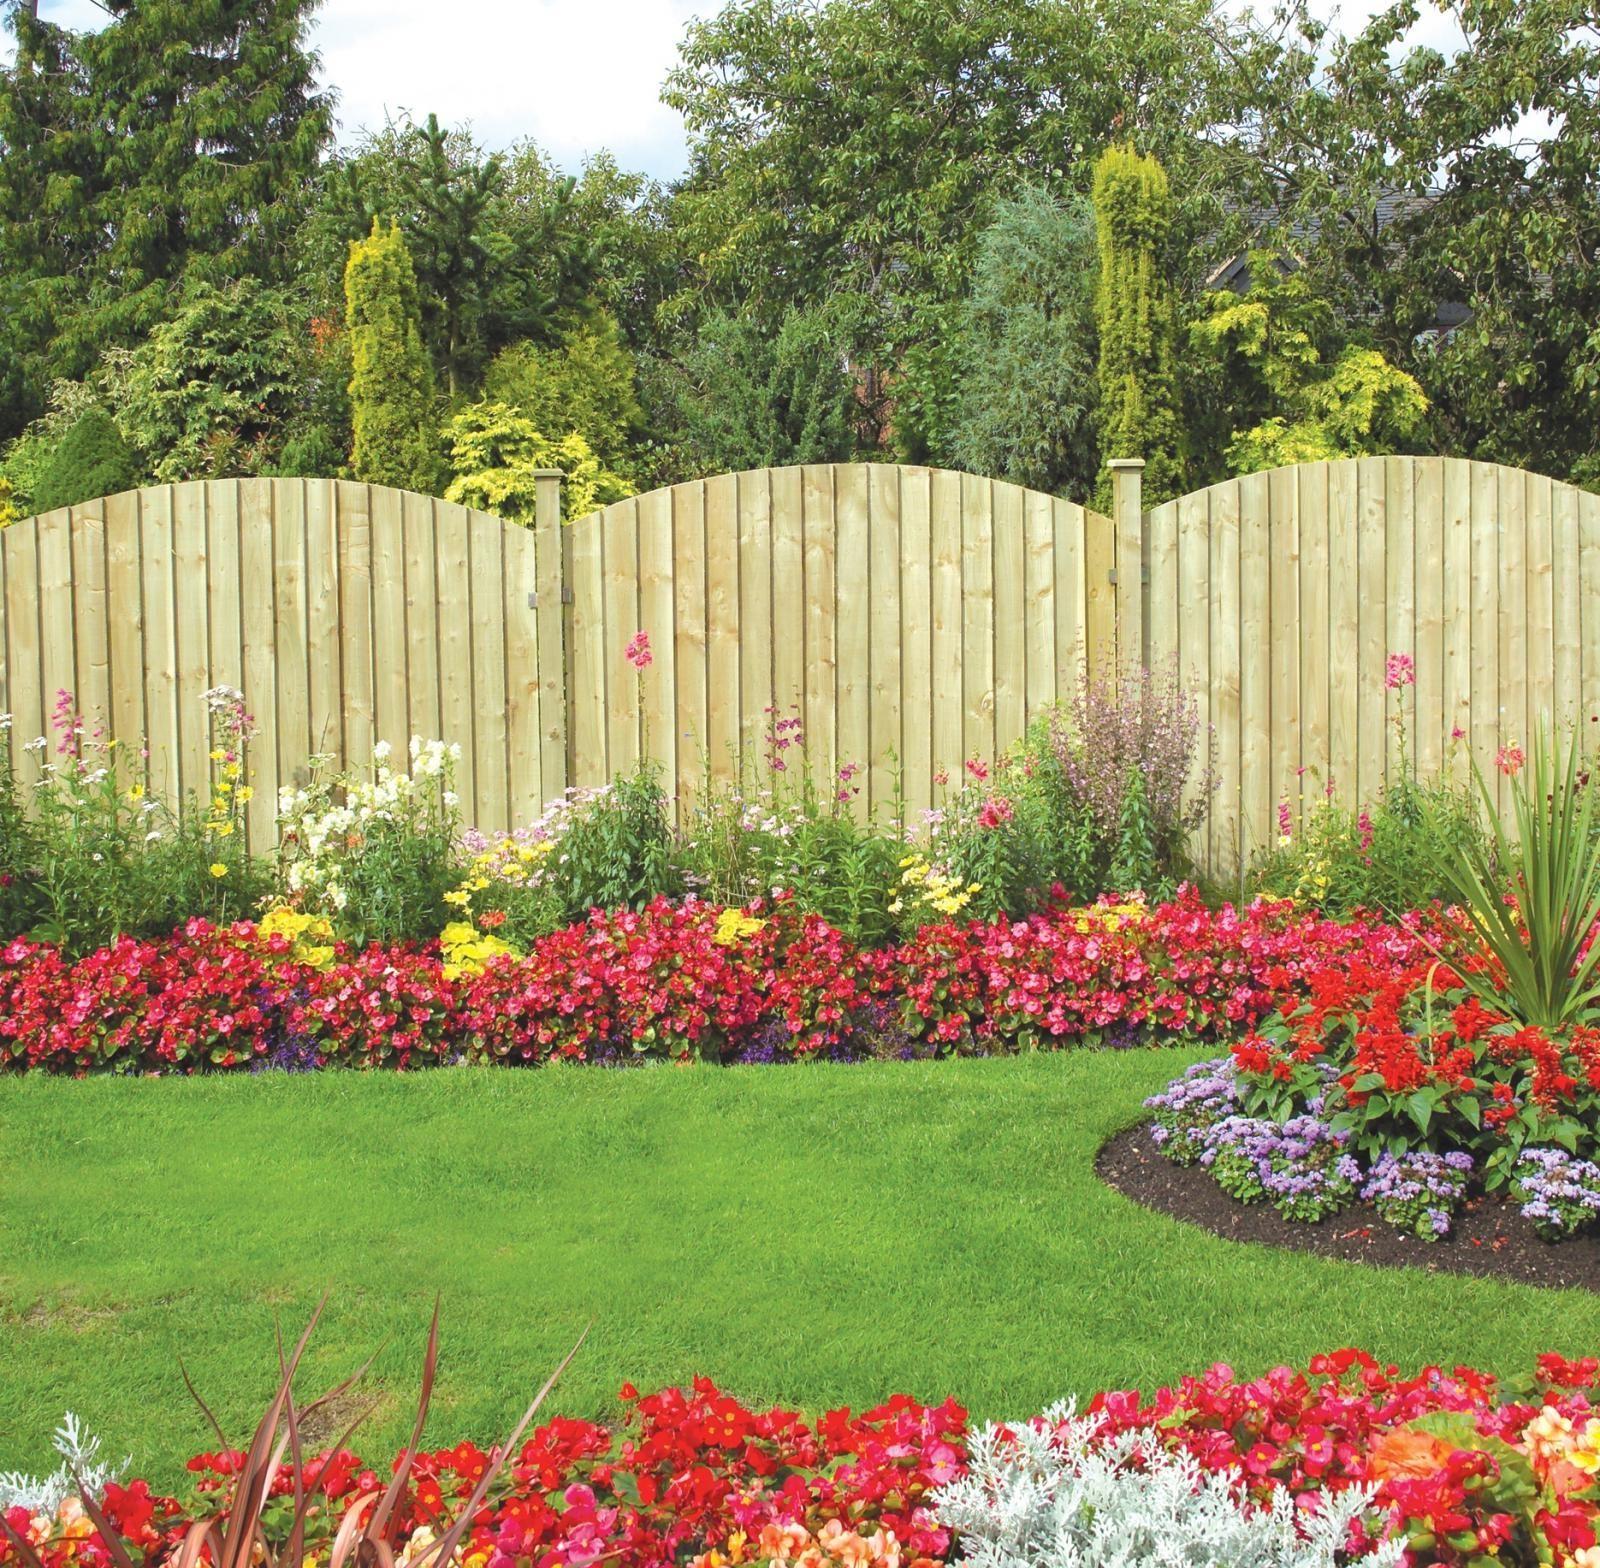 Rustikale Gartenzäune 60 atemberaubende ideen für gartenzäune gartenzäune egal und